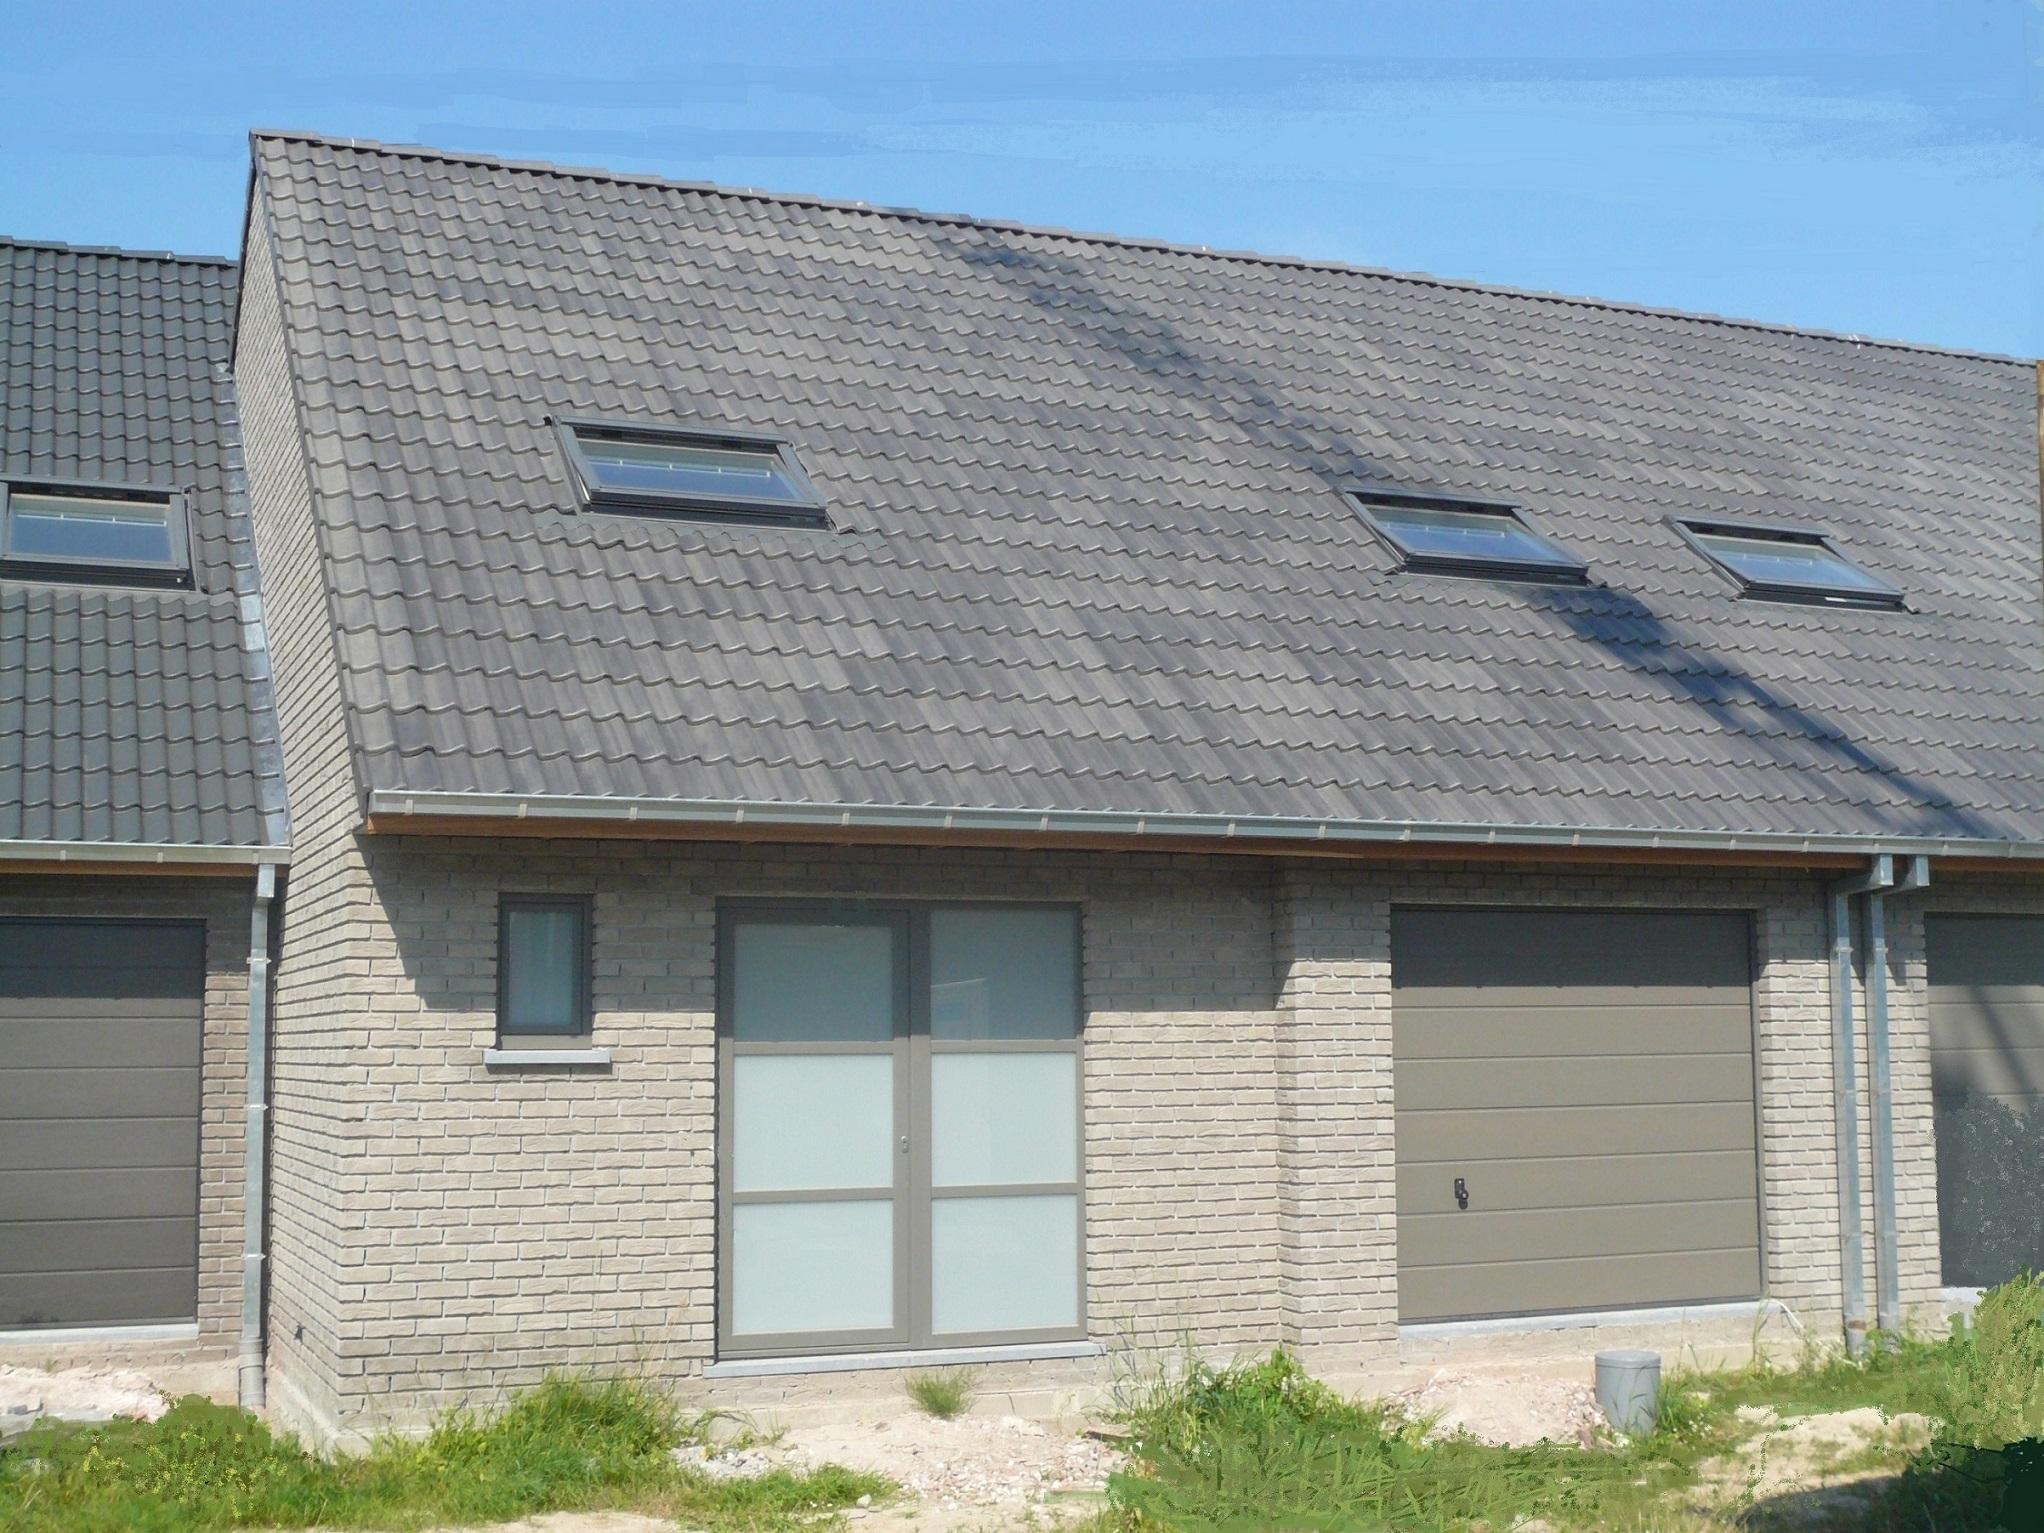 Nieuwbouw Keuken Kosten : Nieuwbouw woning te koop in IZEGEM – Dupont woningen